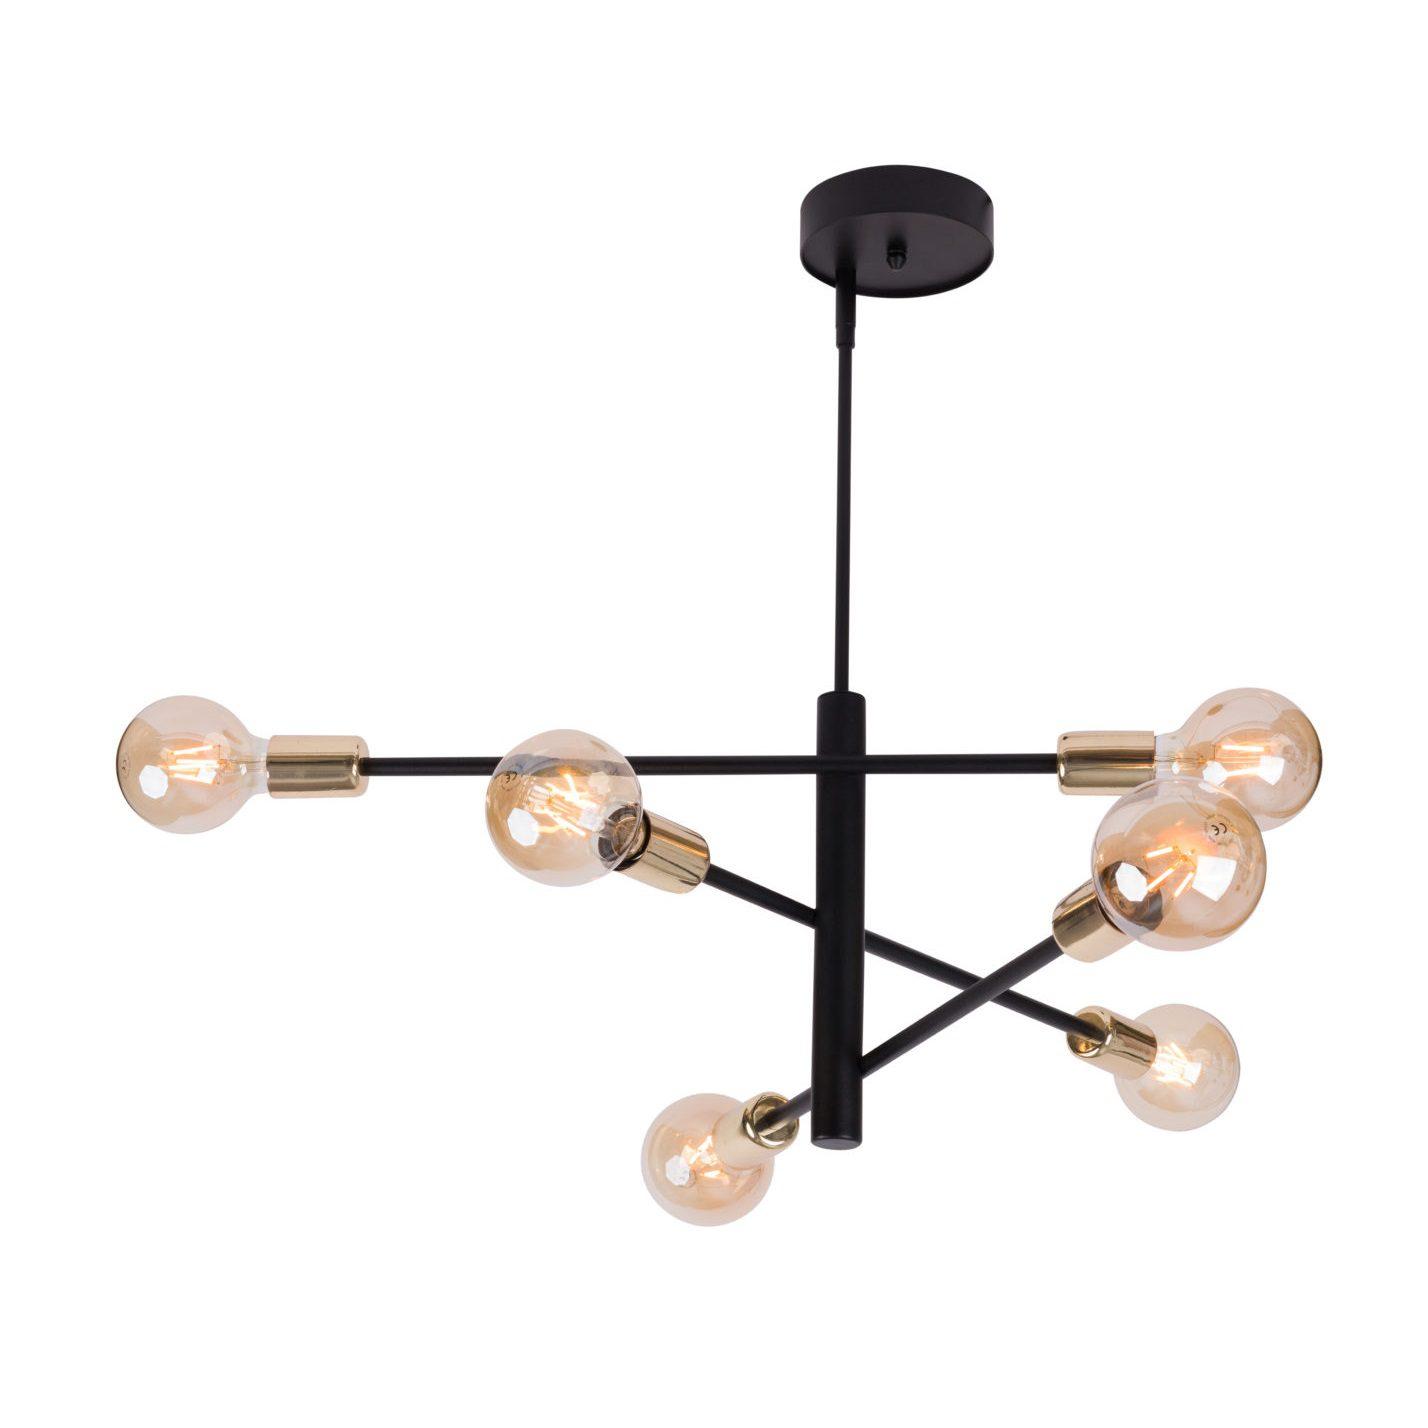 industrialna-lampa-sufitowa-do-jadalni